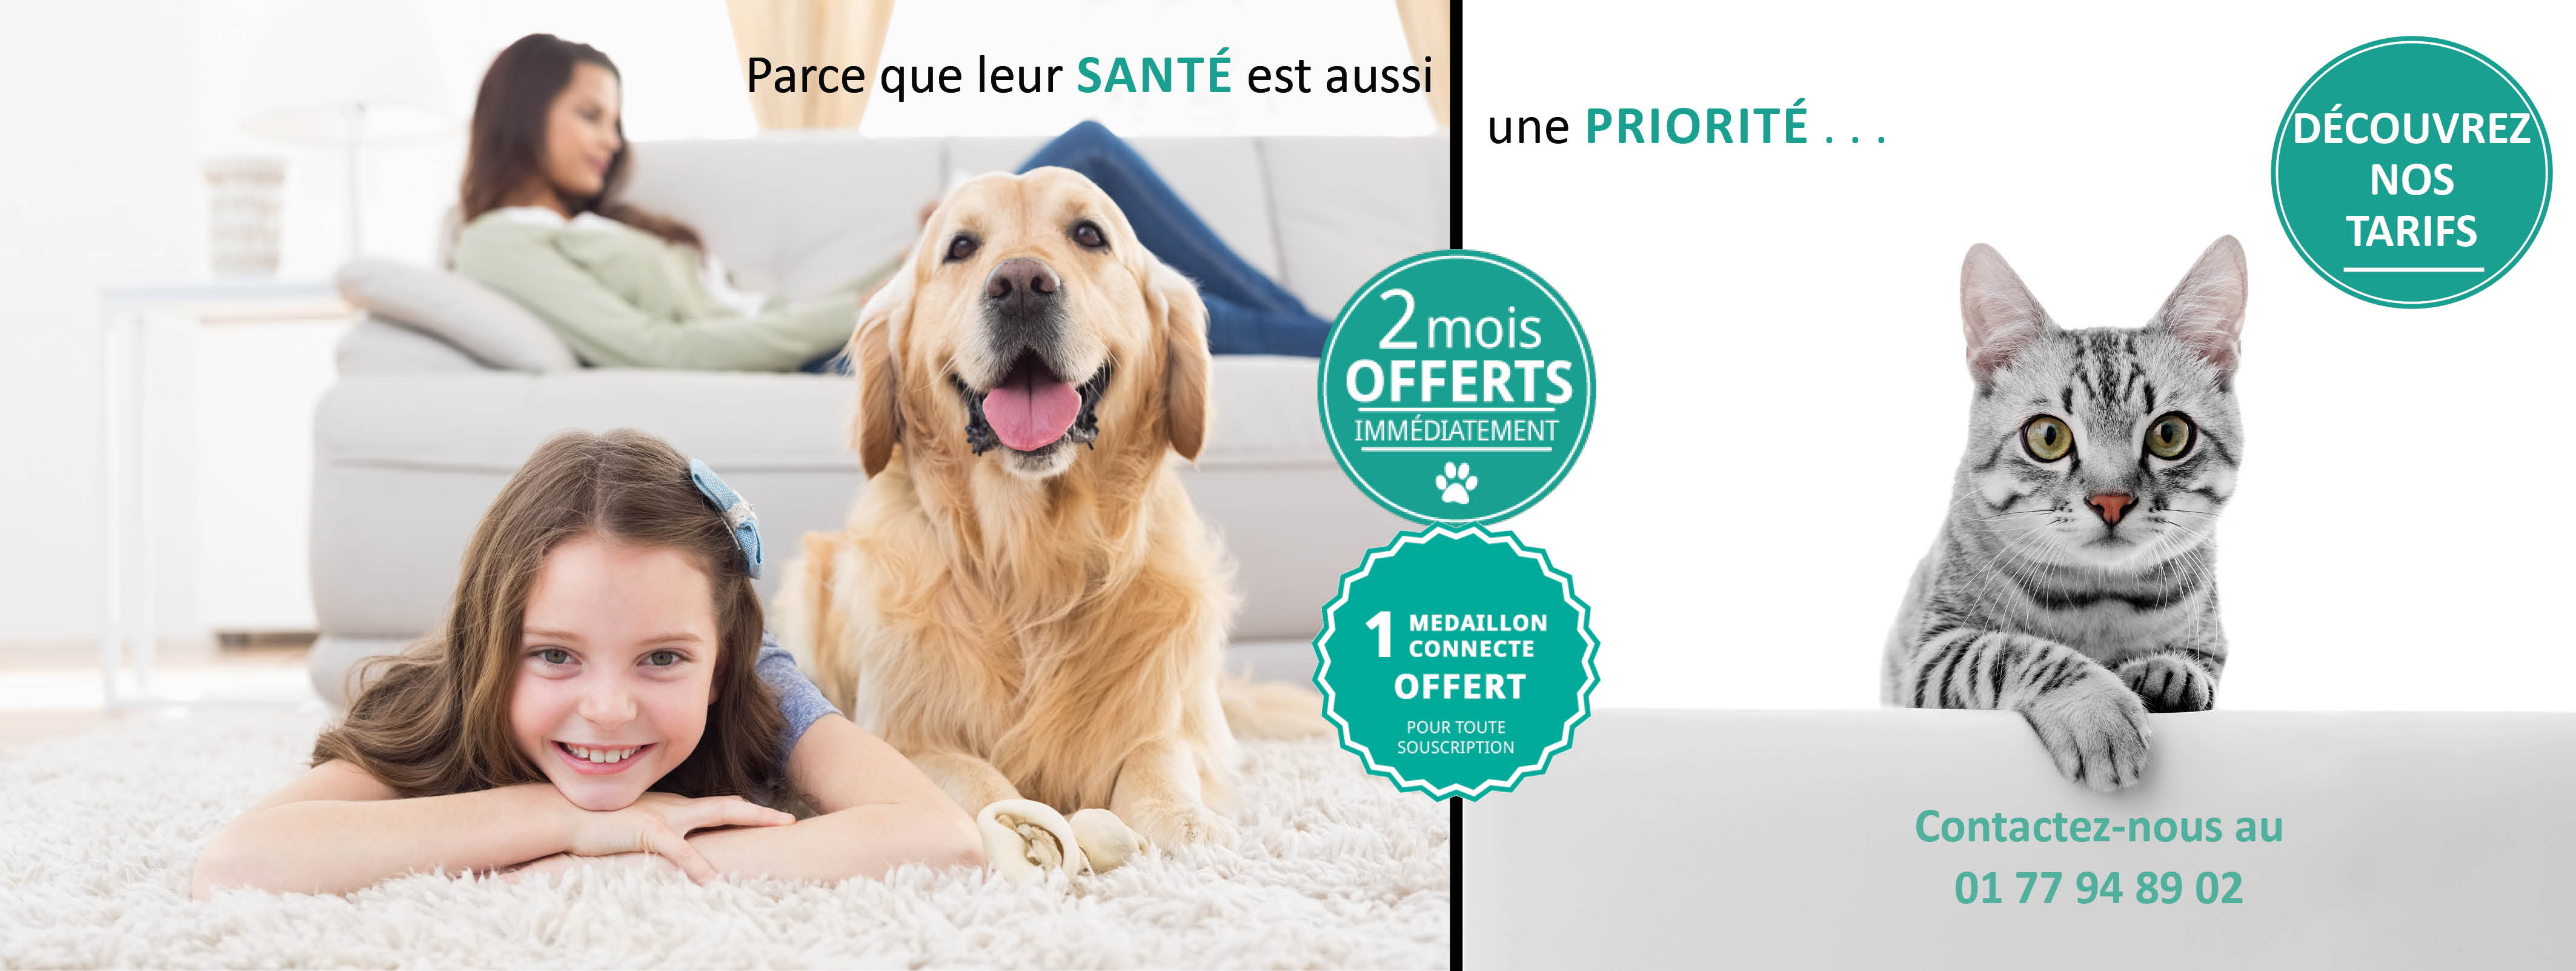 Mutuelle animaux : assurance animaux, assurance chien, assurance chat, mutuelles pour animaux, mutuelle des animaux